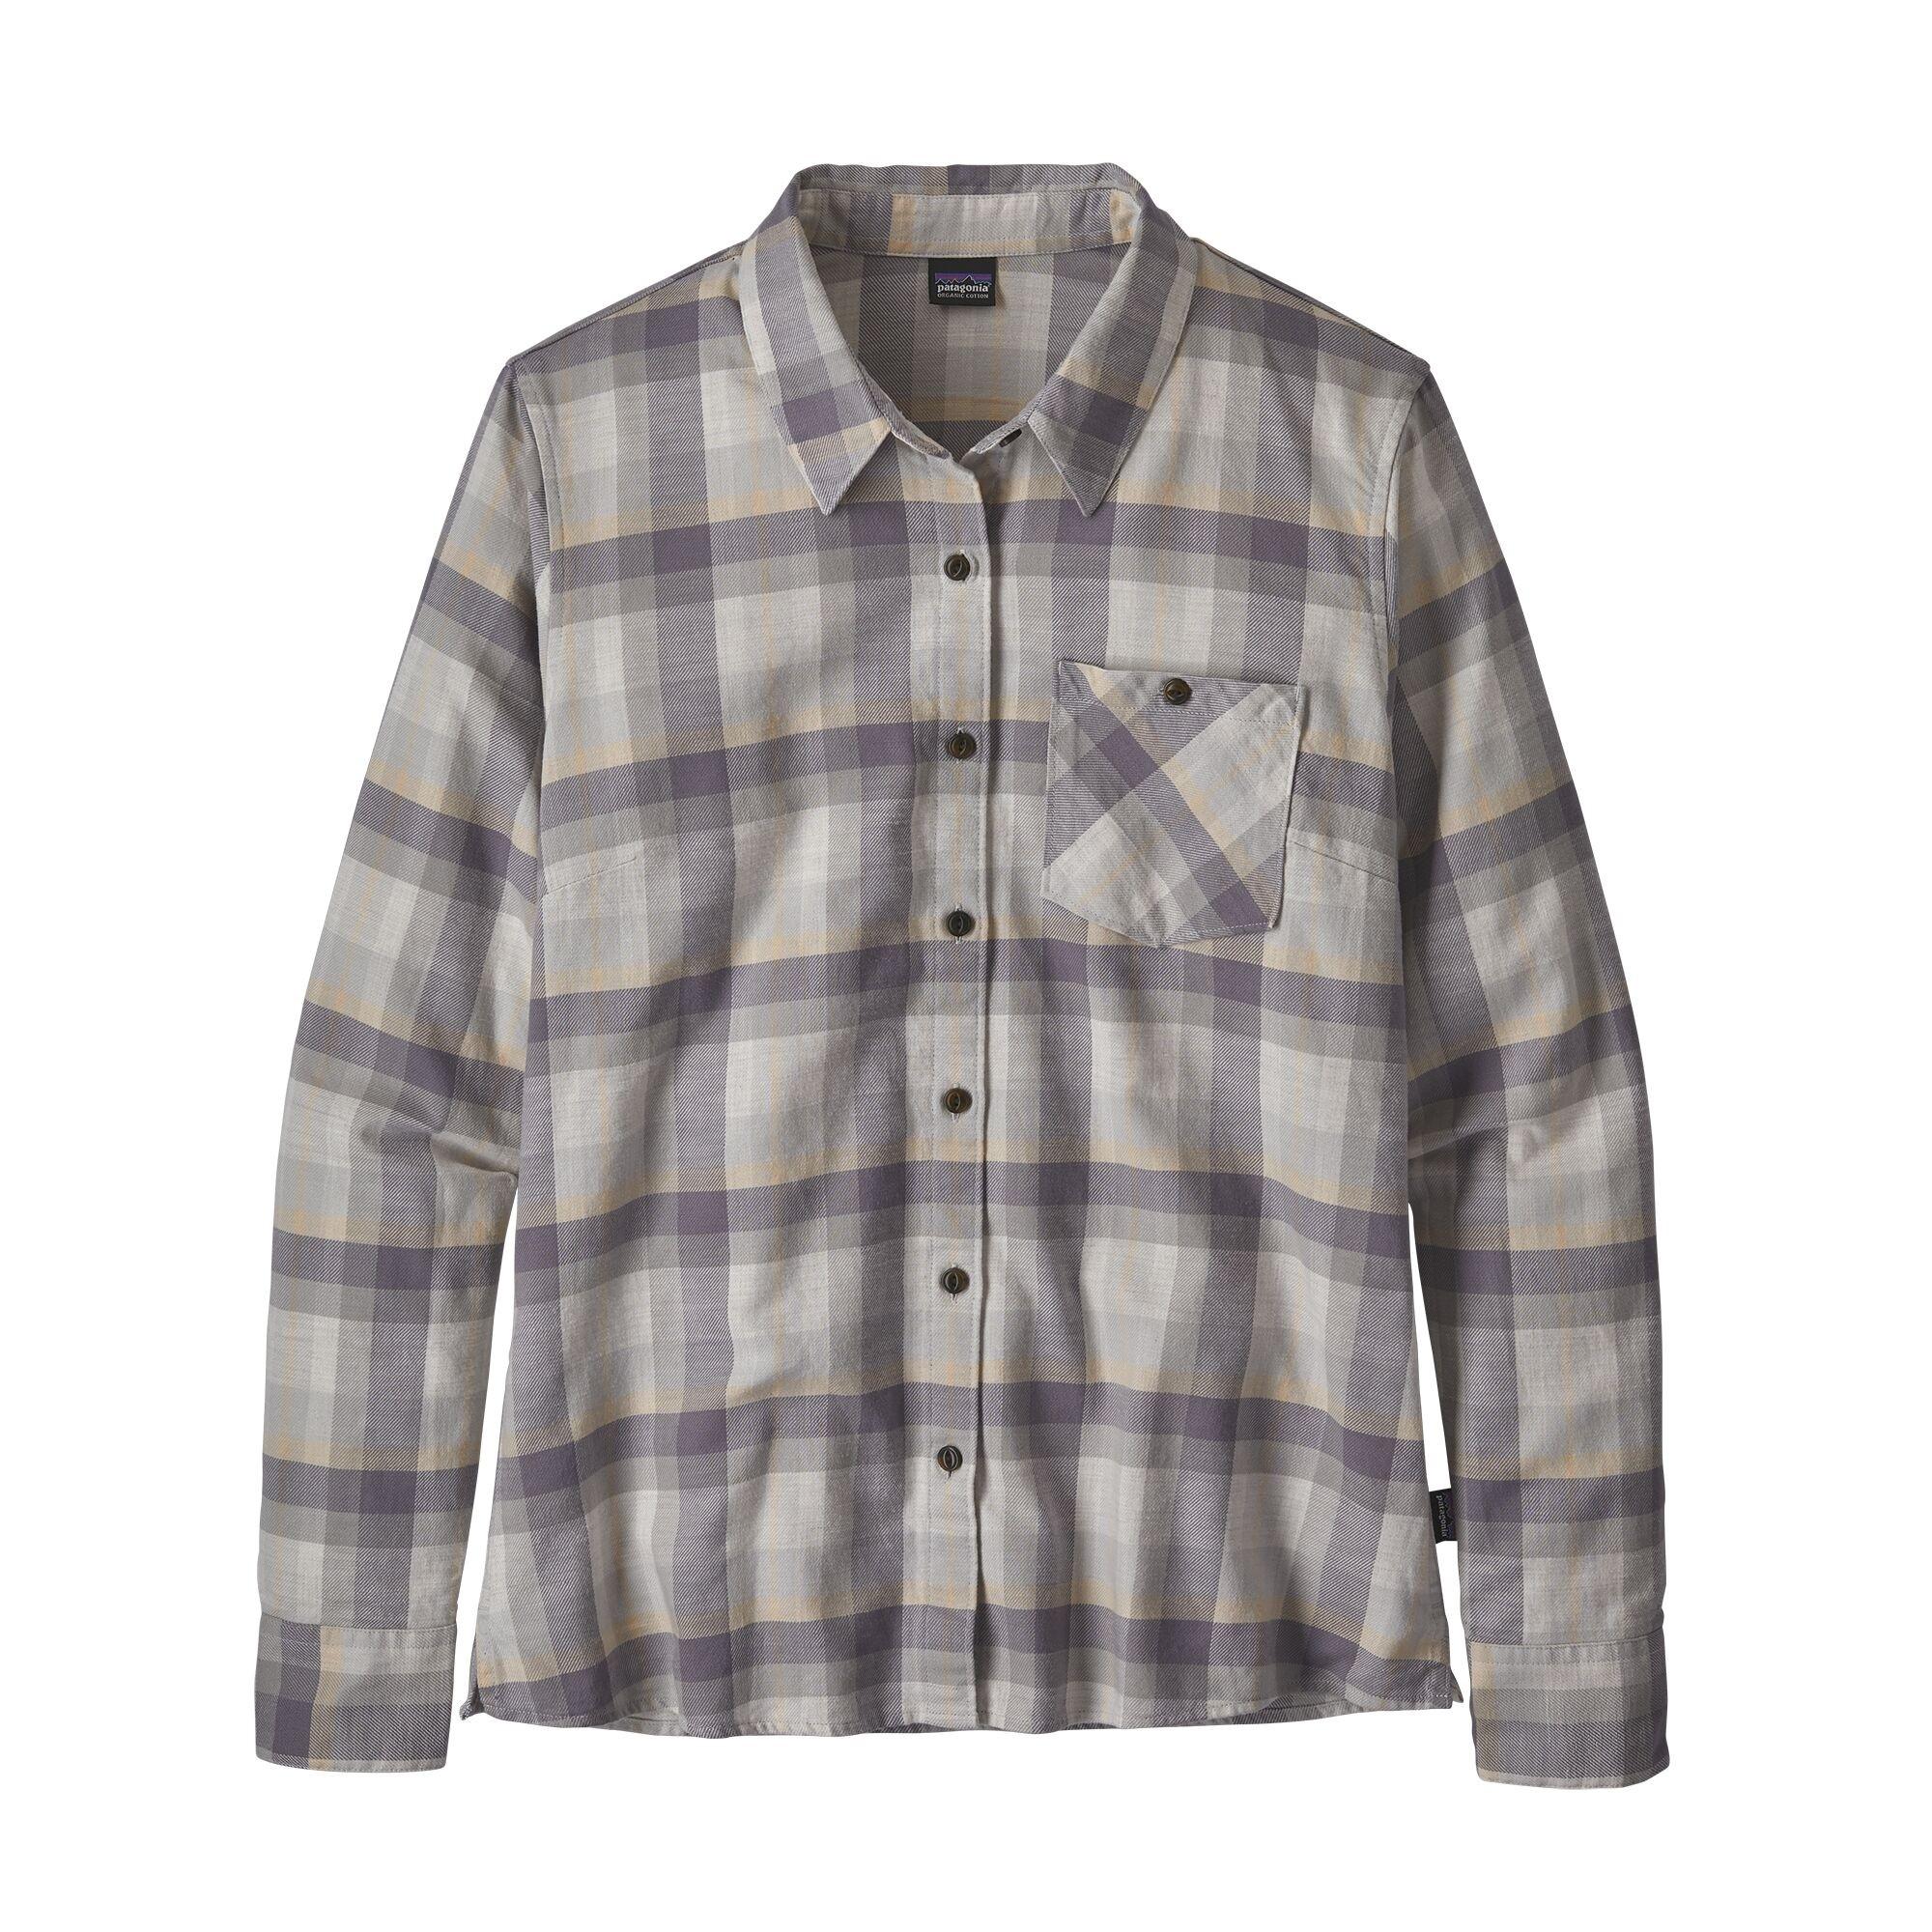 Patagonia Heywood Flannel Shirt Basket: Drifter Grey